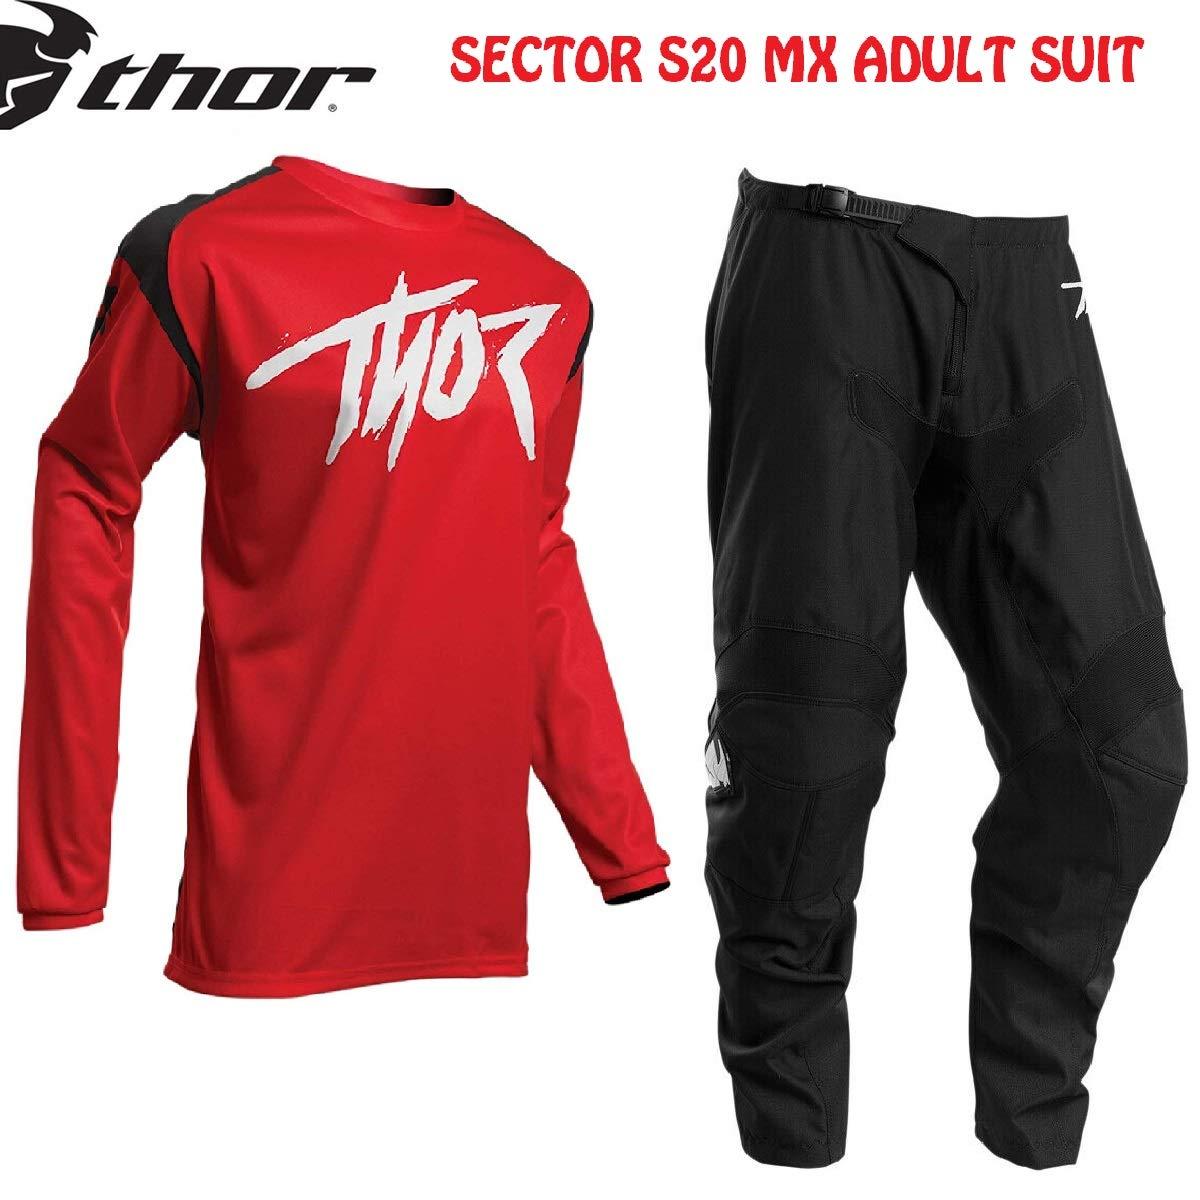 Nero Rosso Thor Tuta Motocross da Corsa Sector-2020 MX Jersey e Pantaloni Moto off-Road Enduro Quad Tute Sport Racewear Camicia e Pants Fuoristrada Cross Racing Suit